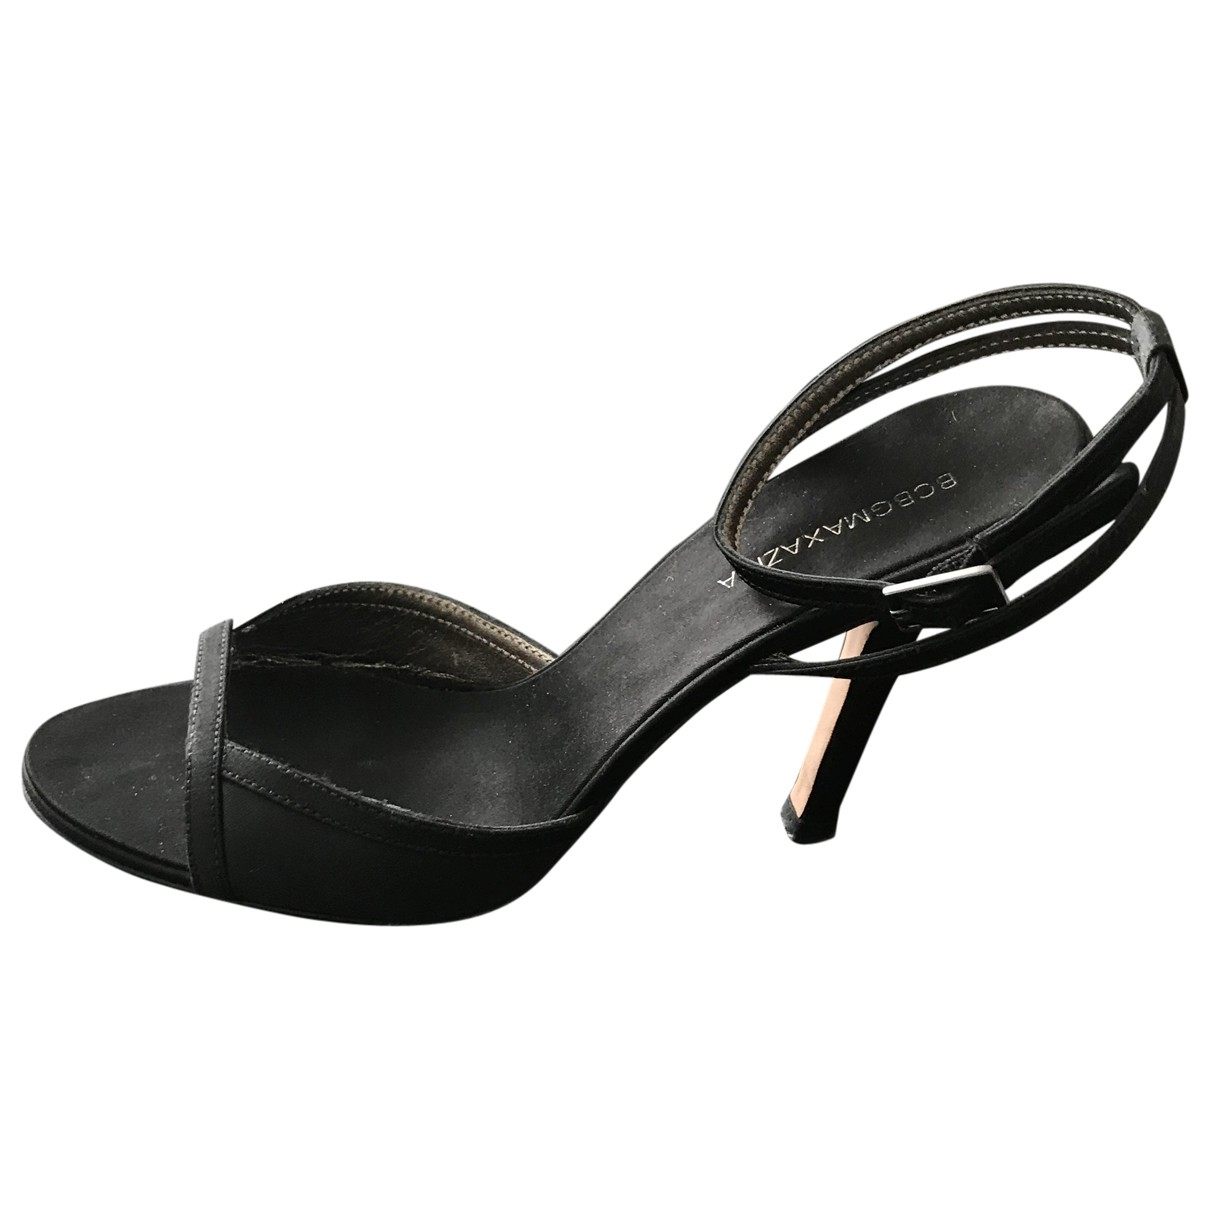 Bcbg Max Azria \N Black Suede Heels for Women 36 EU